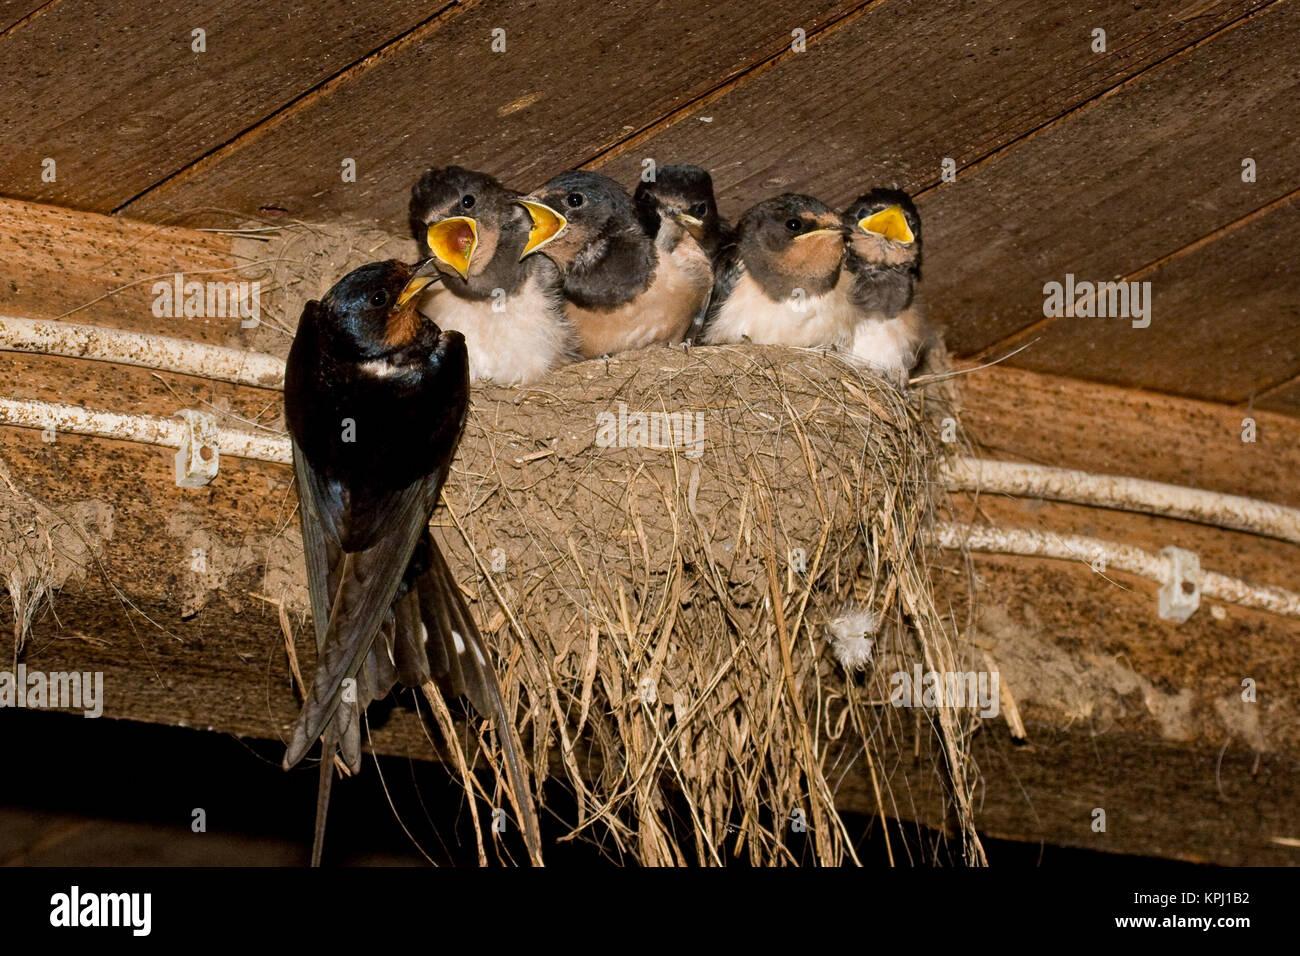 Rauchschwalbe, Rauch-Schwalbe, Rauch - Schwalbe, Altvogel füttert Küken in ihrem Lehmnest, Nest, Hirundo rustica, Stock Photo